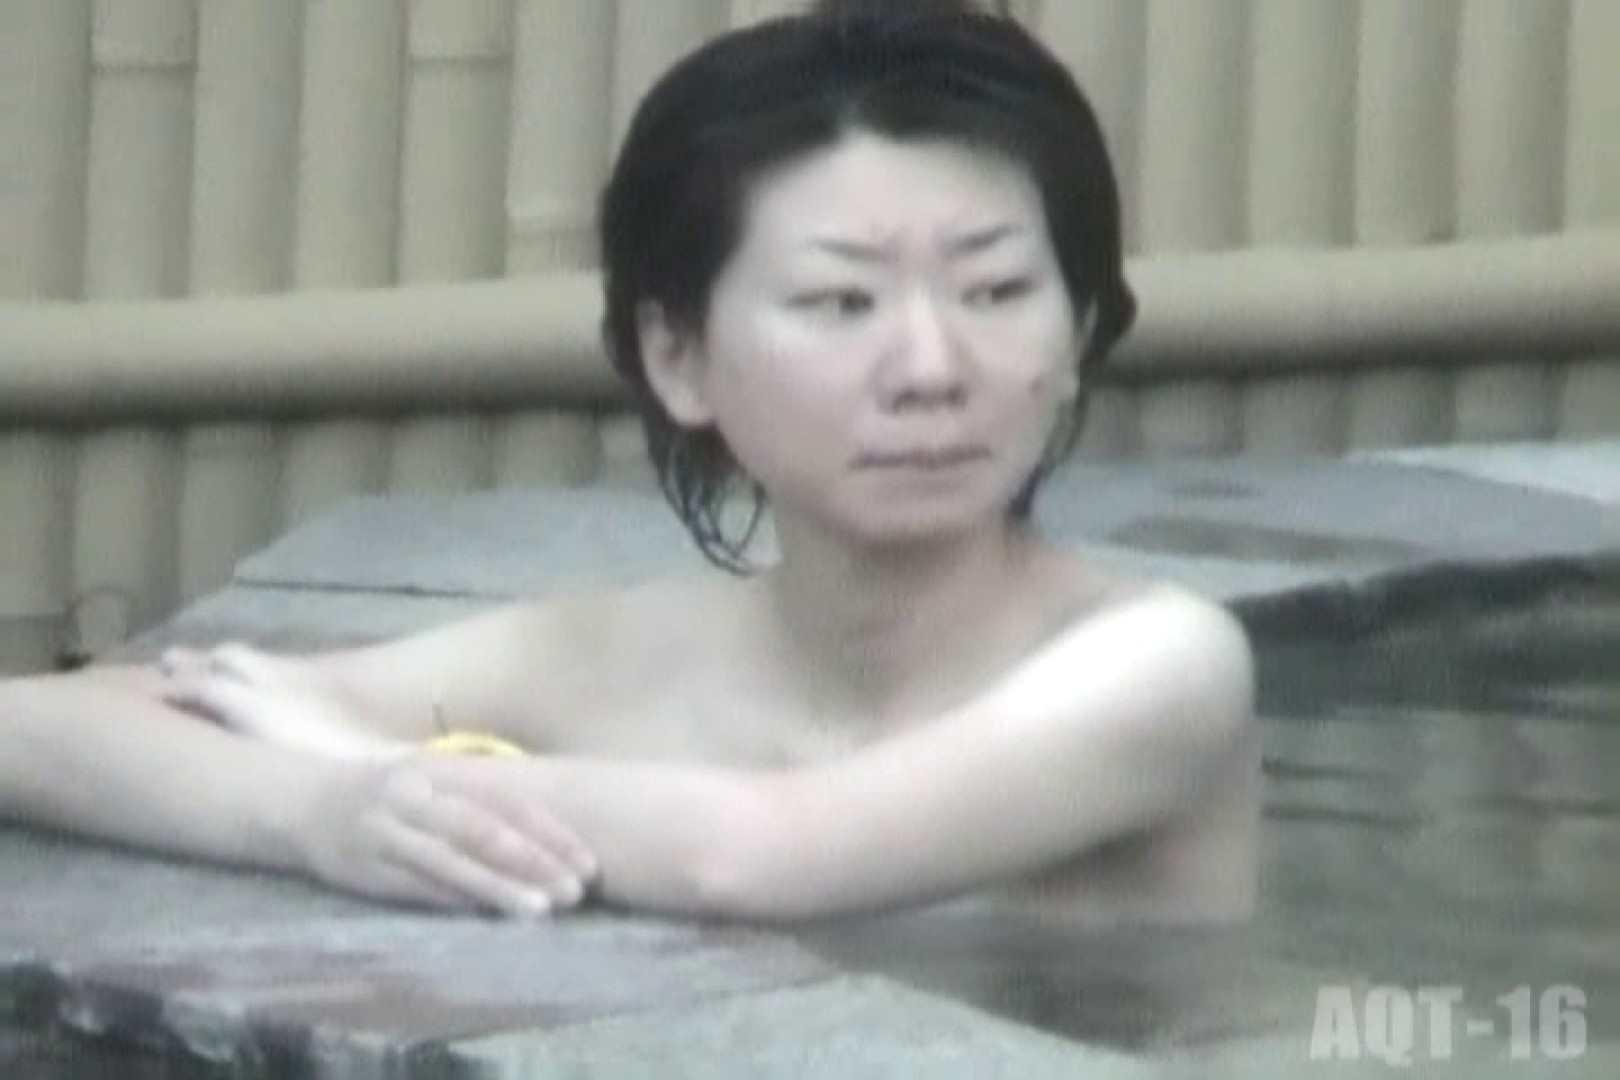 Aquaな露天風呂Vol.842 盗撮師作品  96pic 60